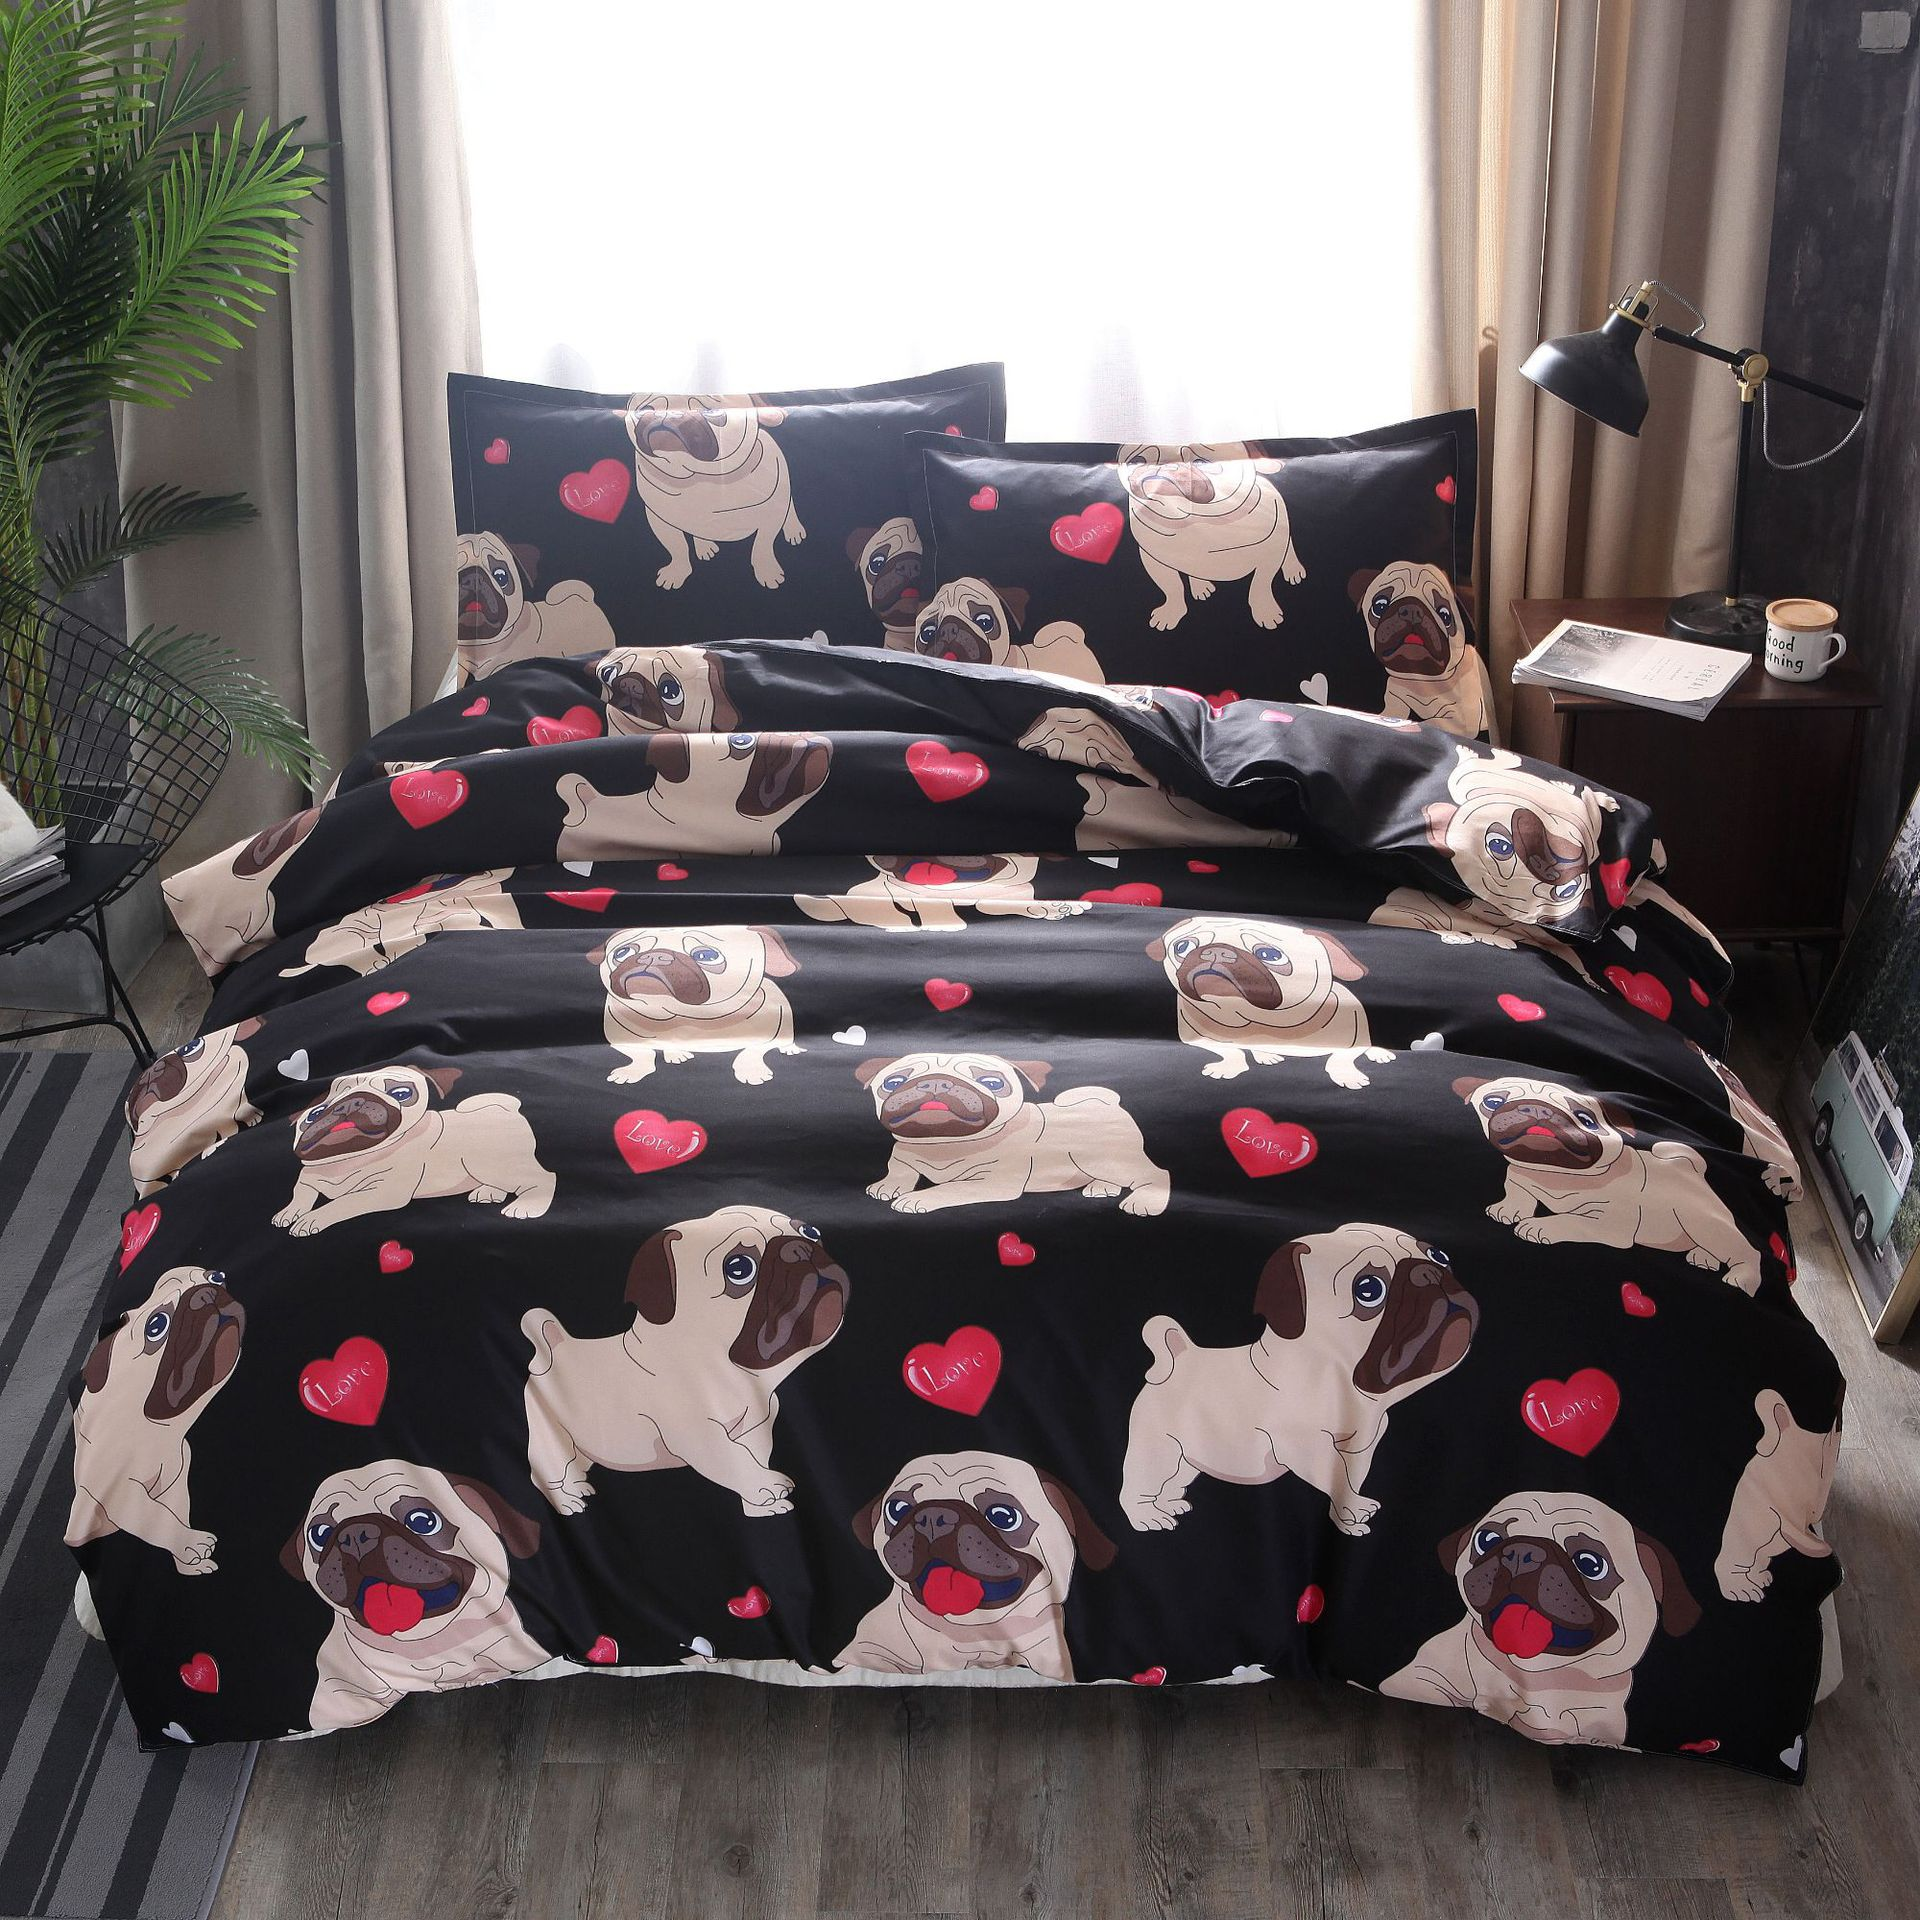 Hot Selling Bulldog Dog Europe And America Australia Size Bedding Article Three Four-piece Set